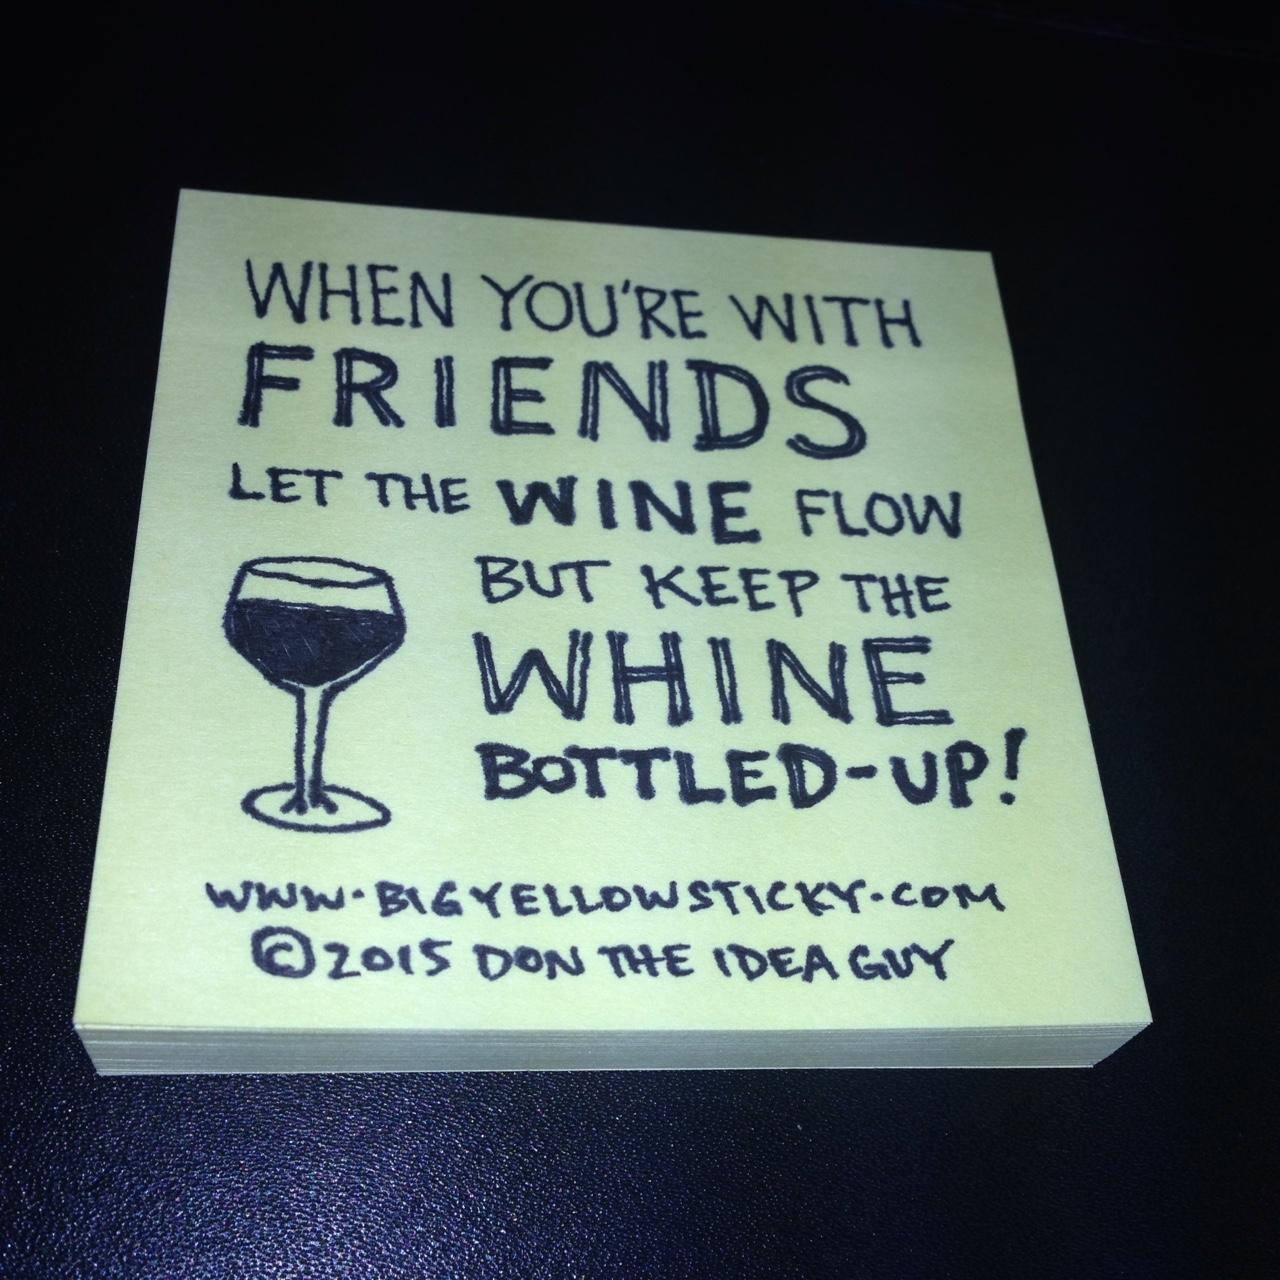 Bottles of Whine